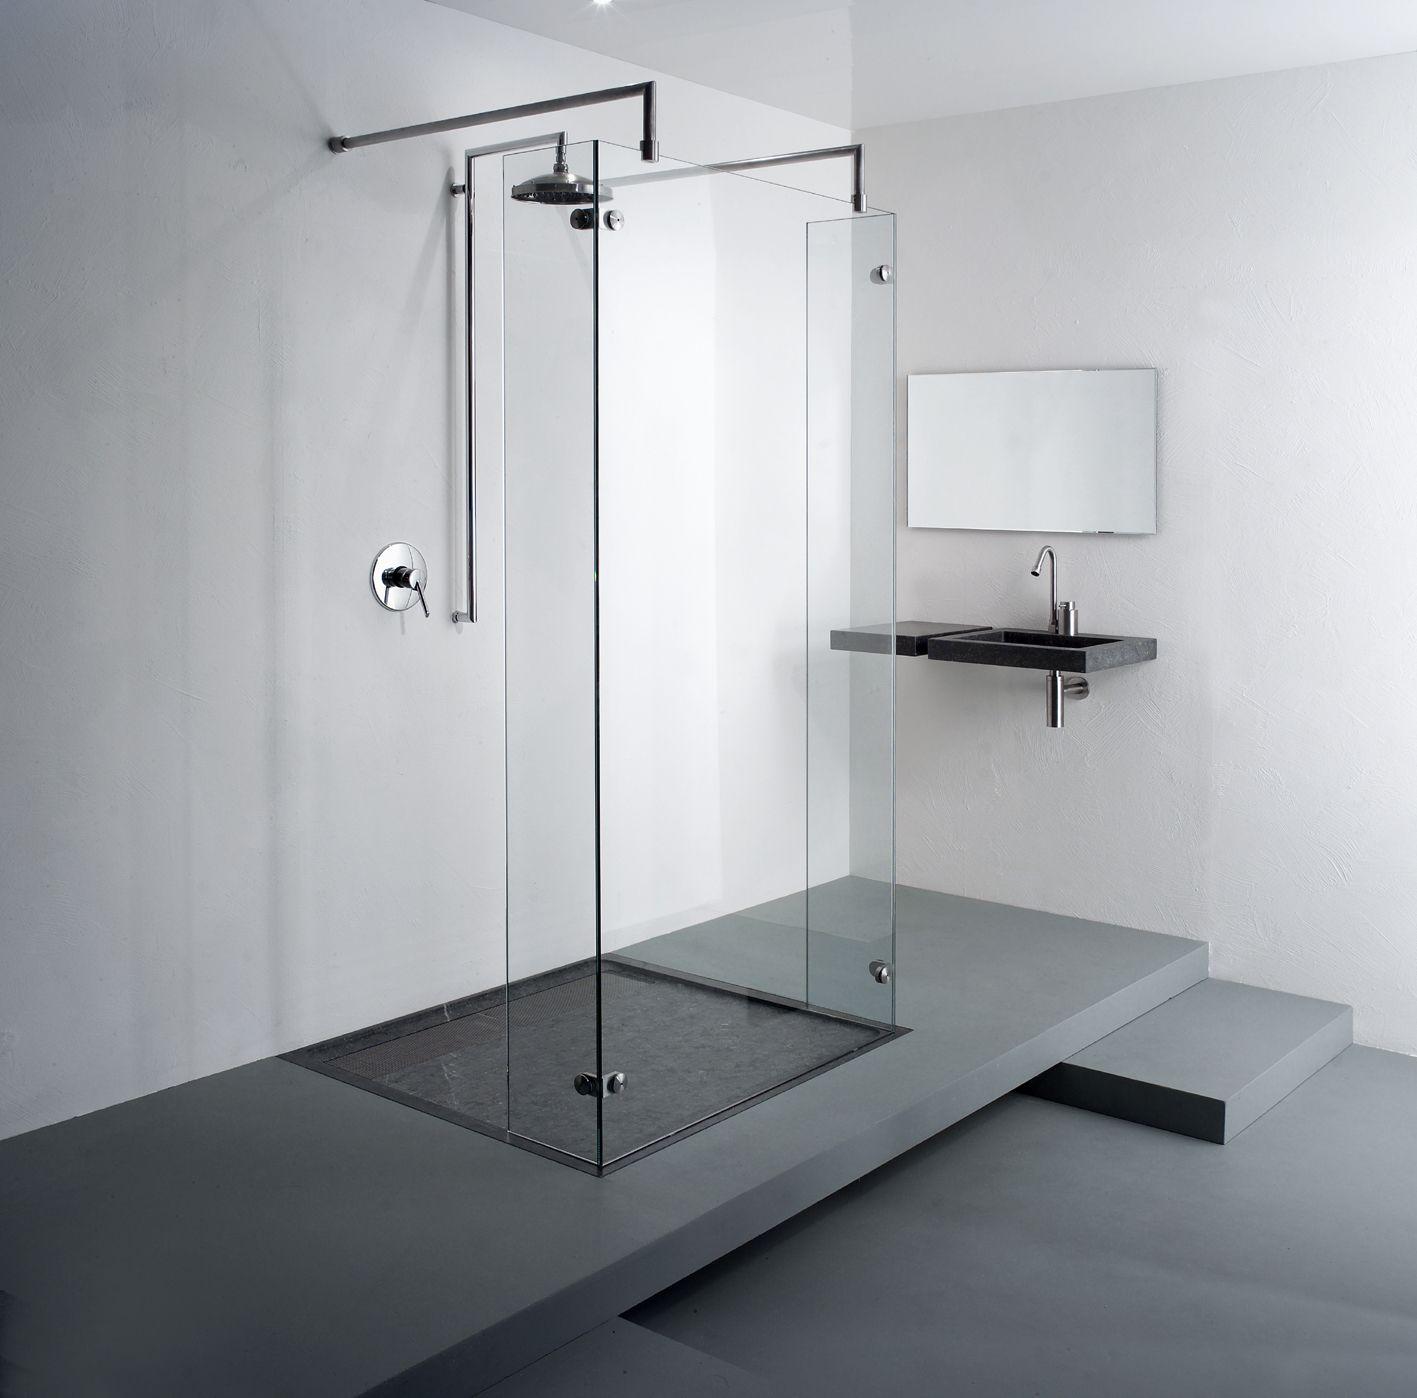 Freestanding shower freestyle model 9730 balance bathroom w a l k i n pinterest - Badkamer epuree ...